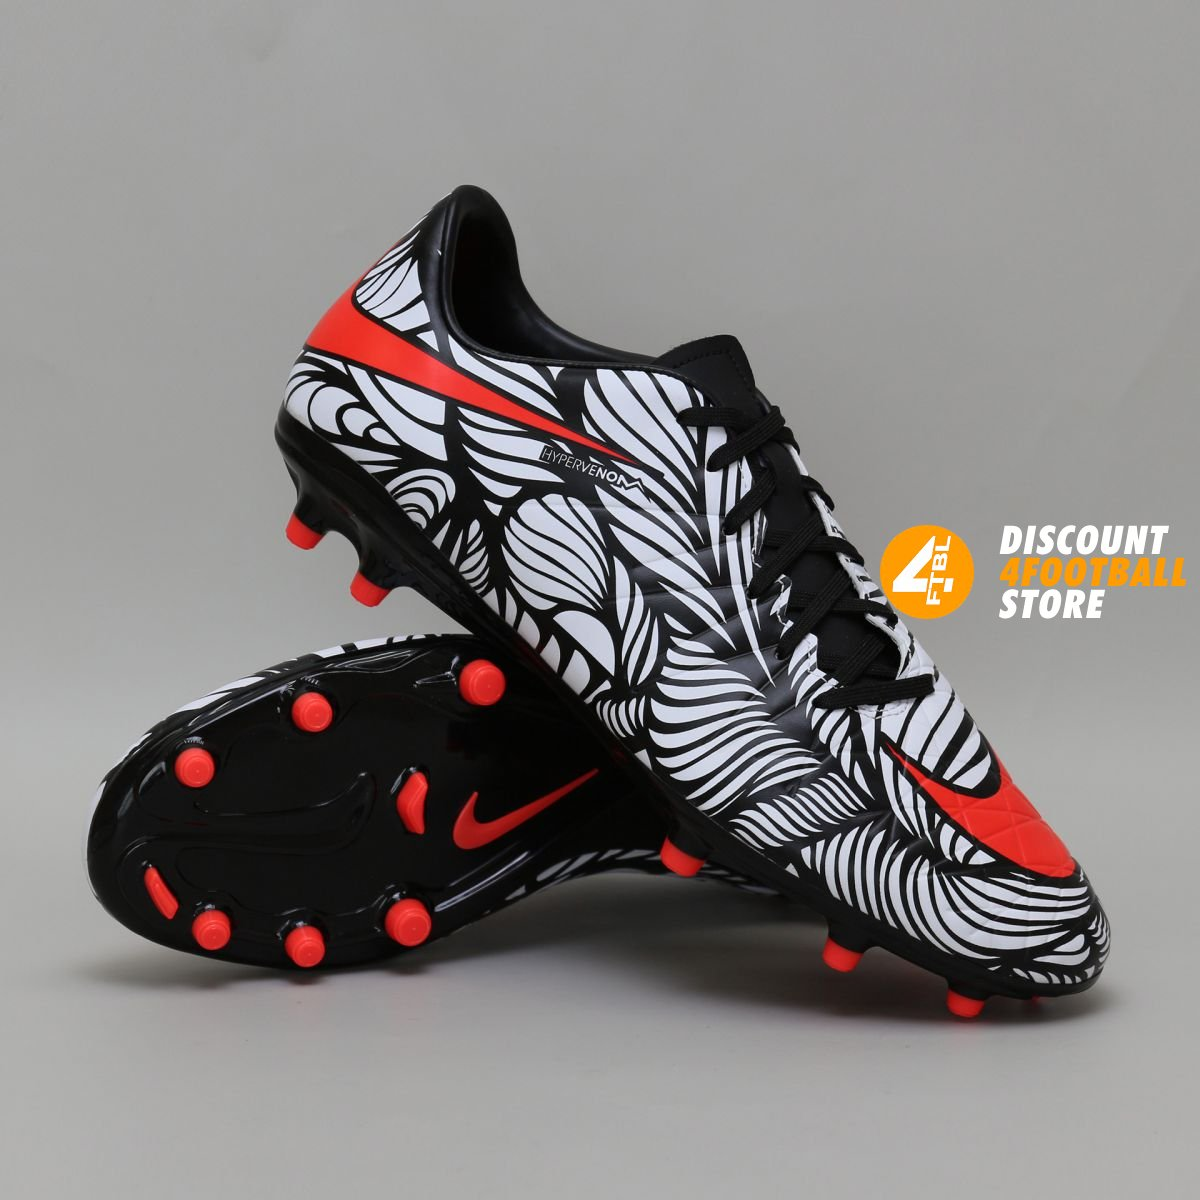 9a8f5eb1 Бутсы Nike Hypervenom Phelon 2 FG Neymar Limited Edition (820113-061) ...